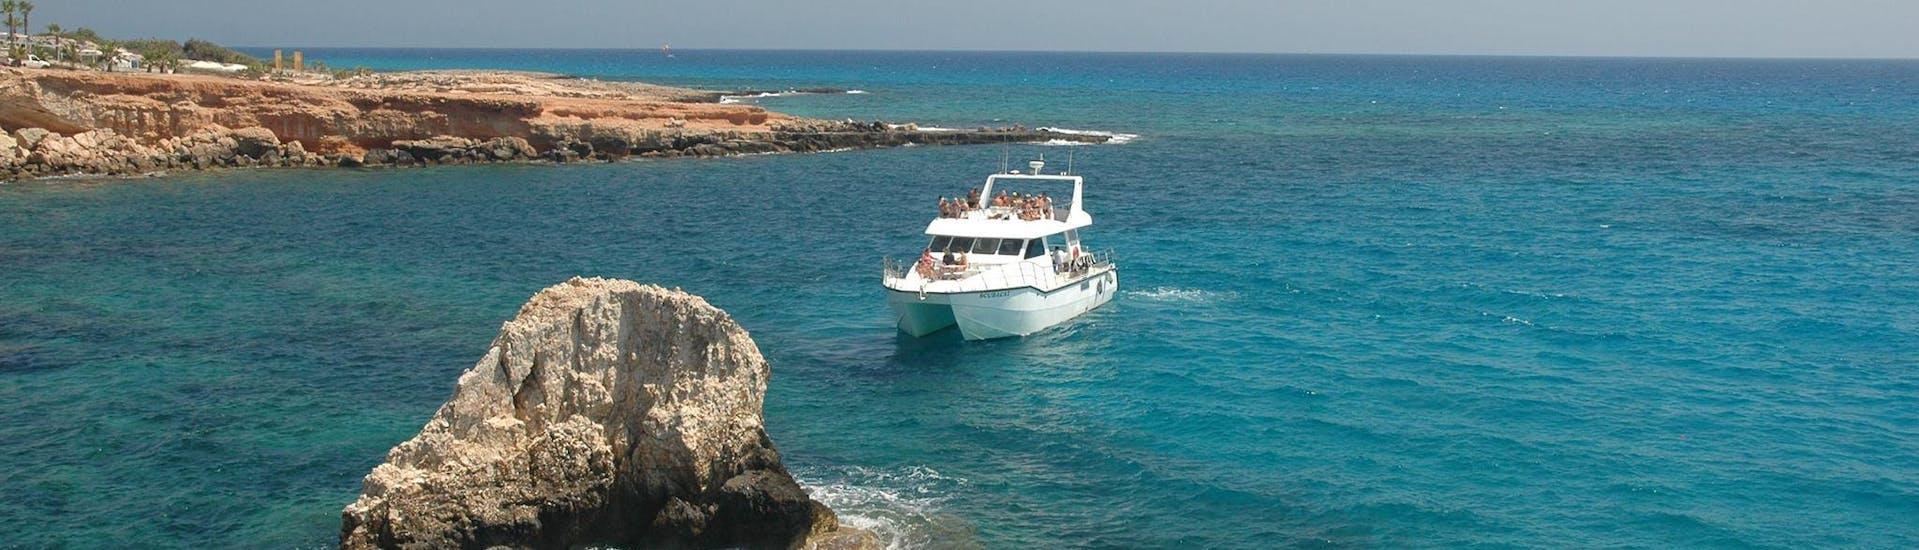 Snorkeling Excursion around Cyprus avec The Scuba Base Ayia Napa - Hero image